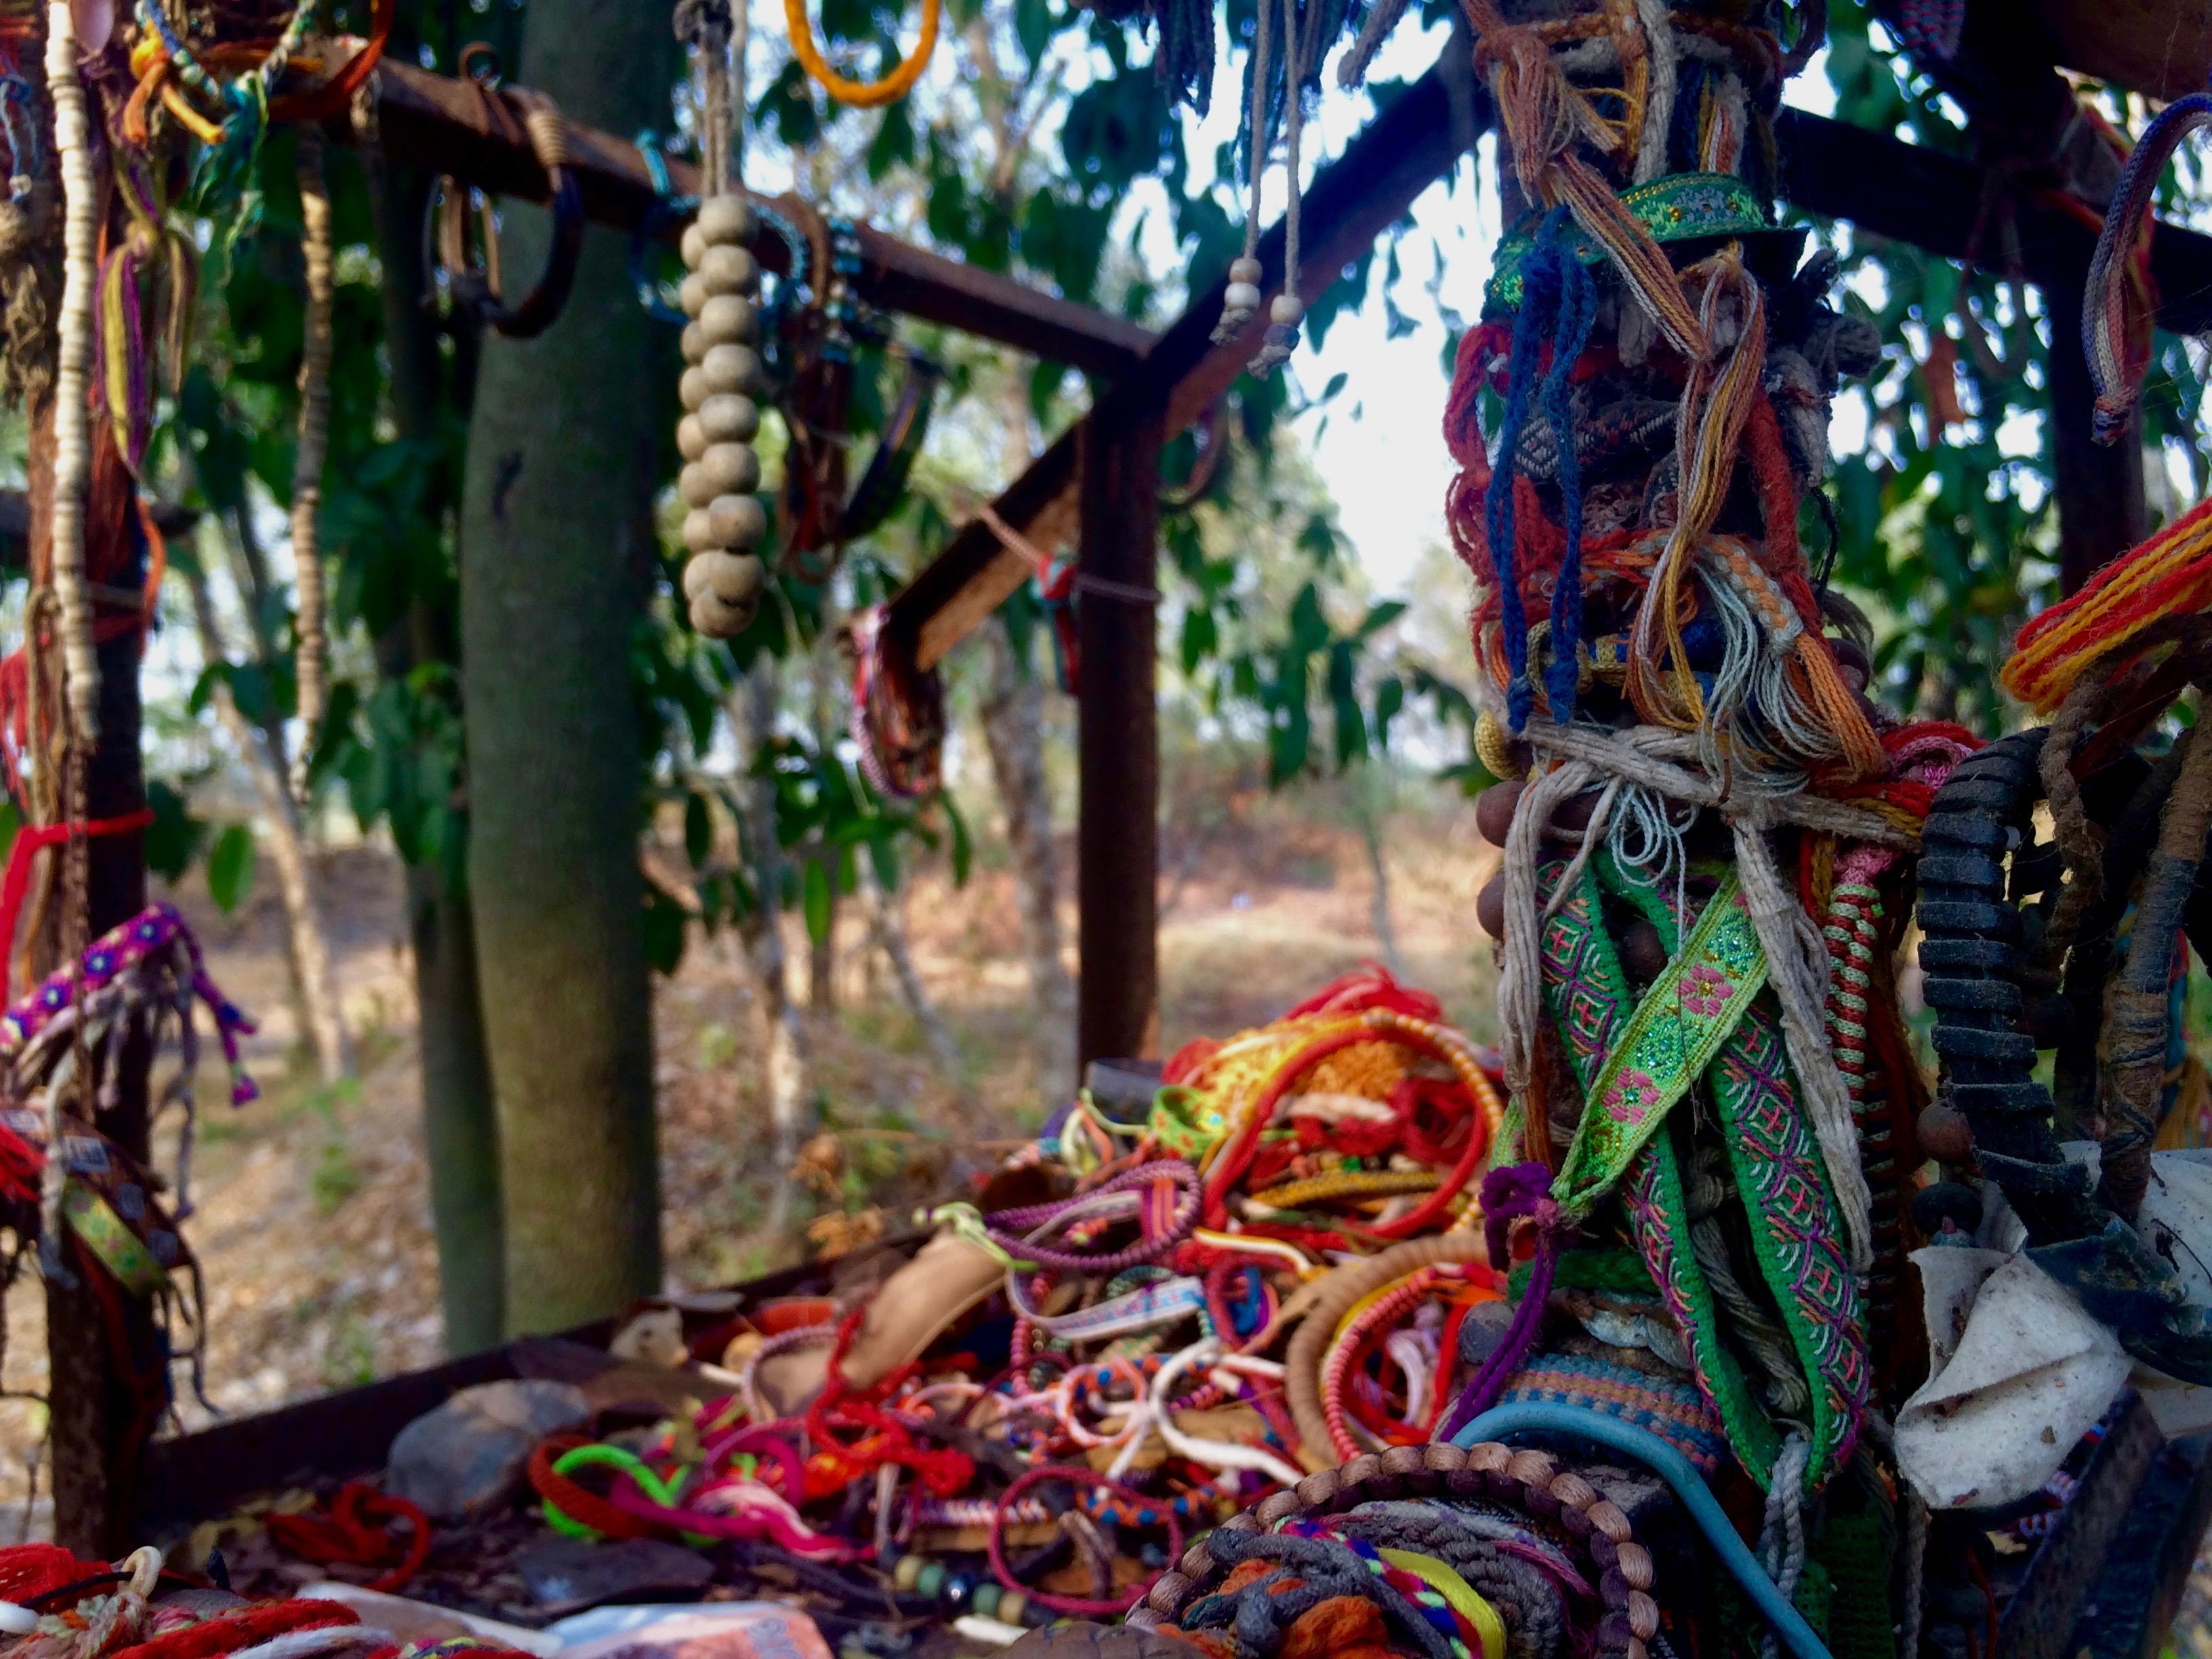 Reisetipp Kambodscha: Killingfiels in Pnom Penh